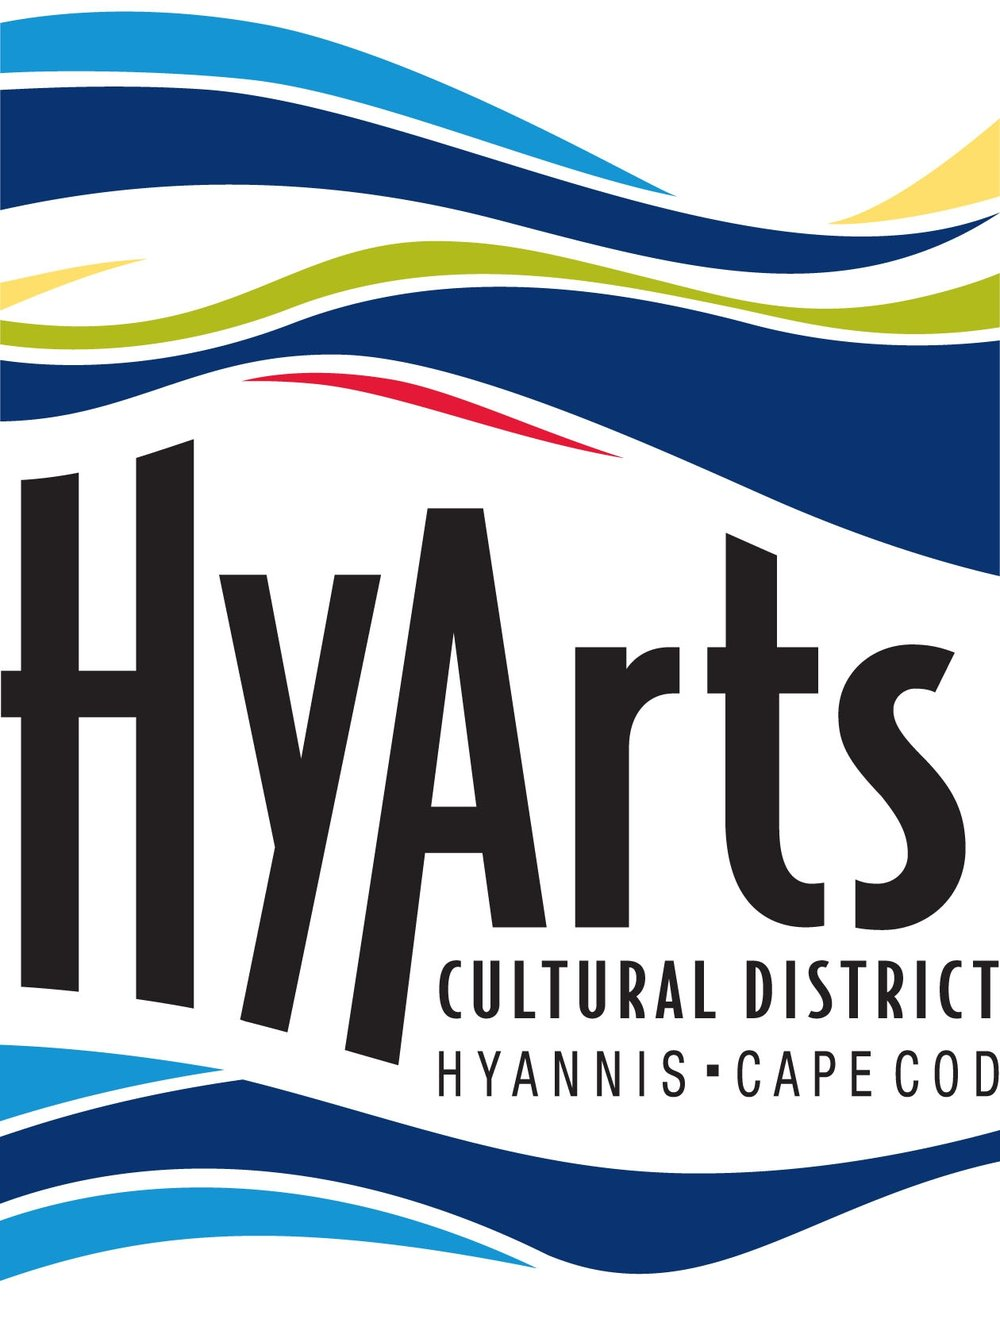 HYArts_cultural districtlogo.JPG